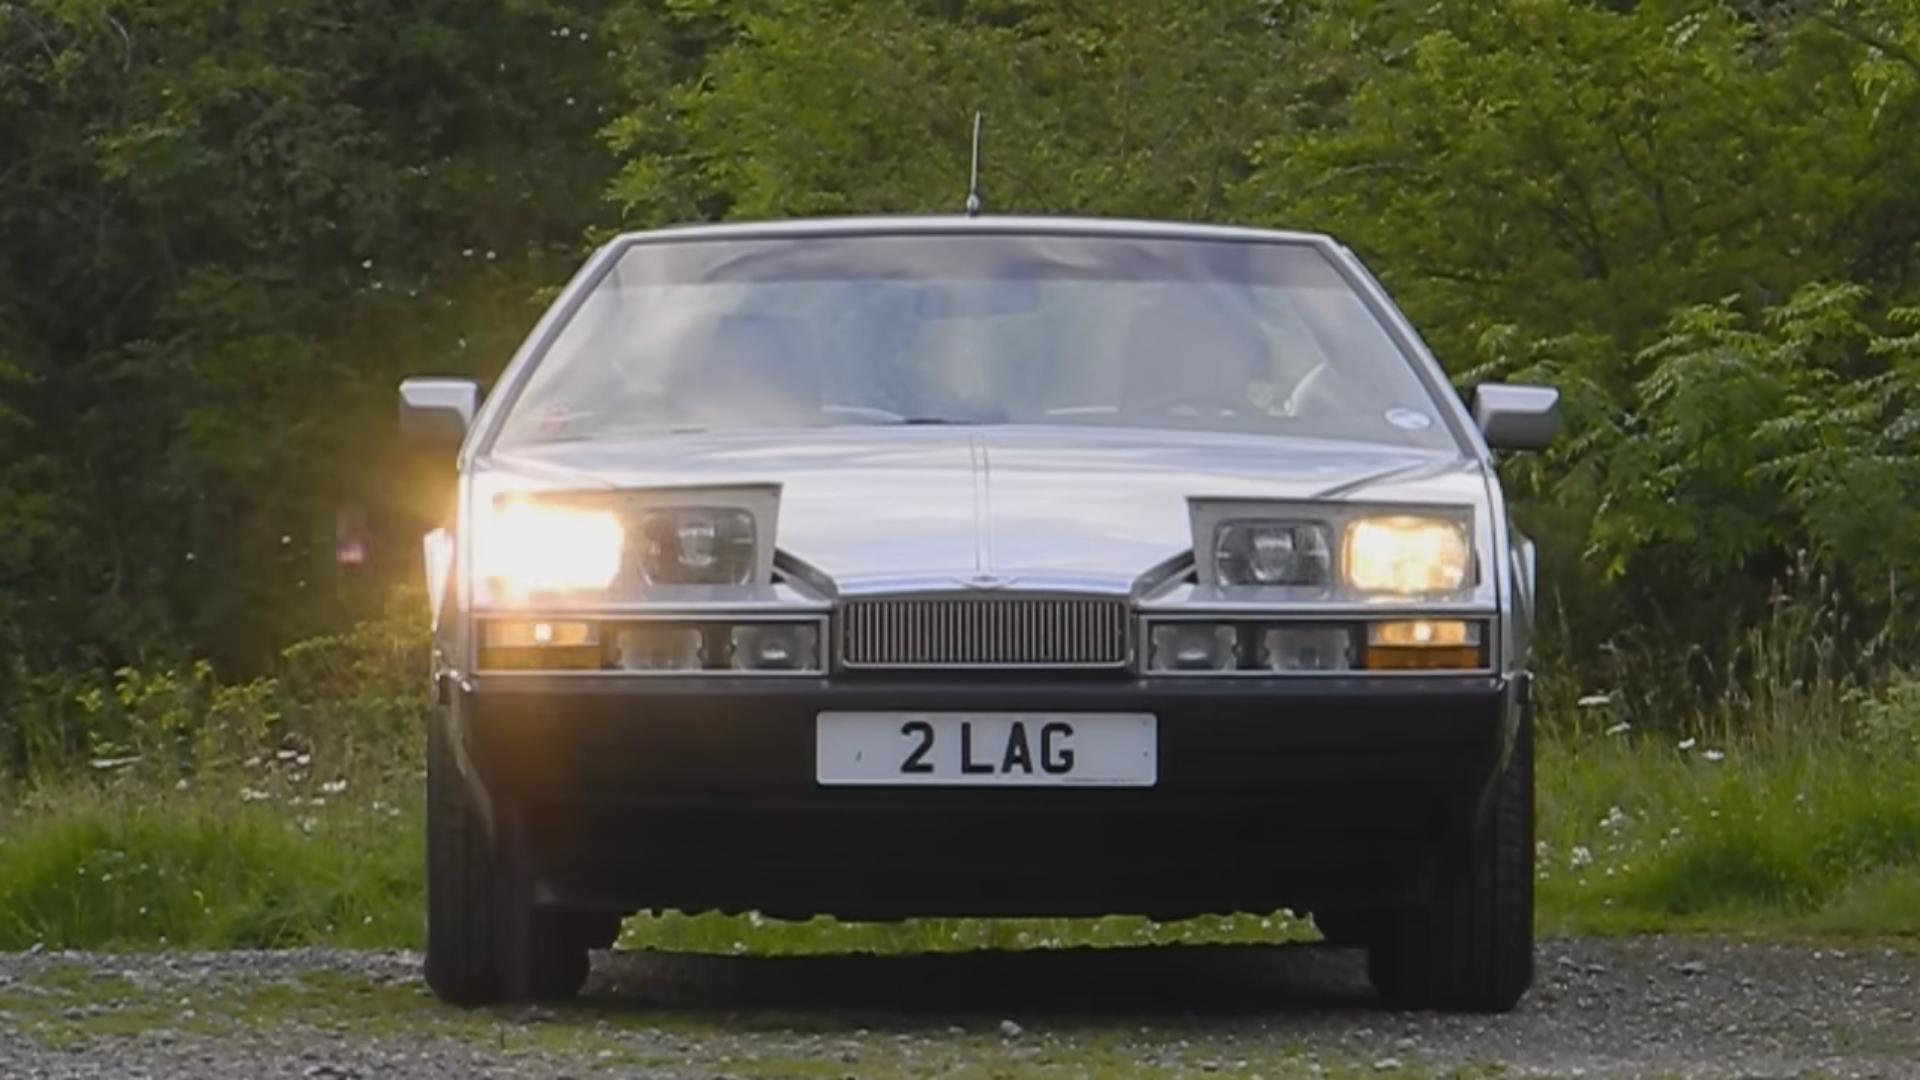 Cars With Pop Up Lights - Aston Martin Lagonda